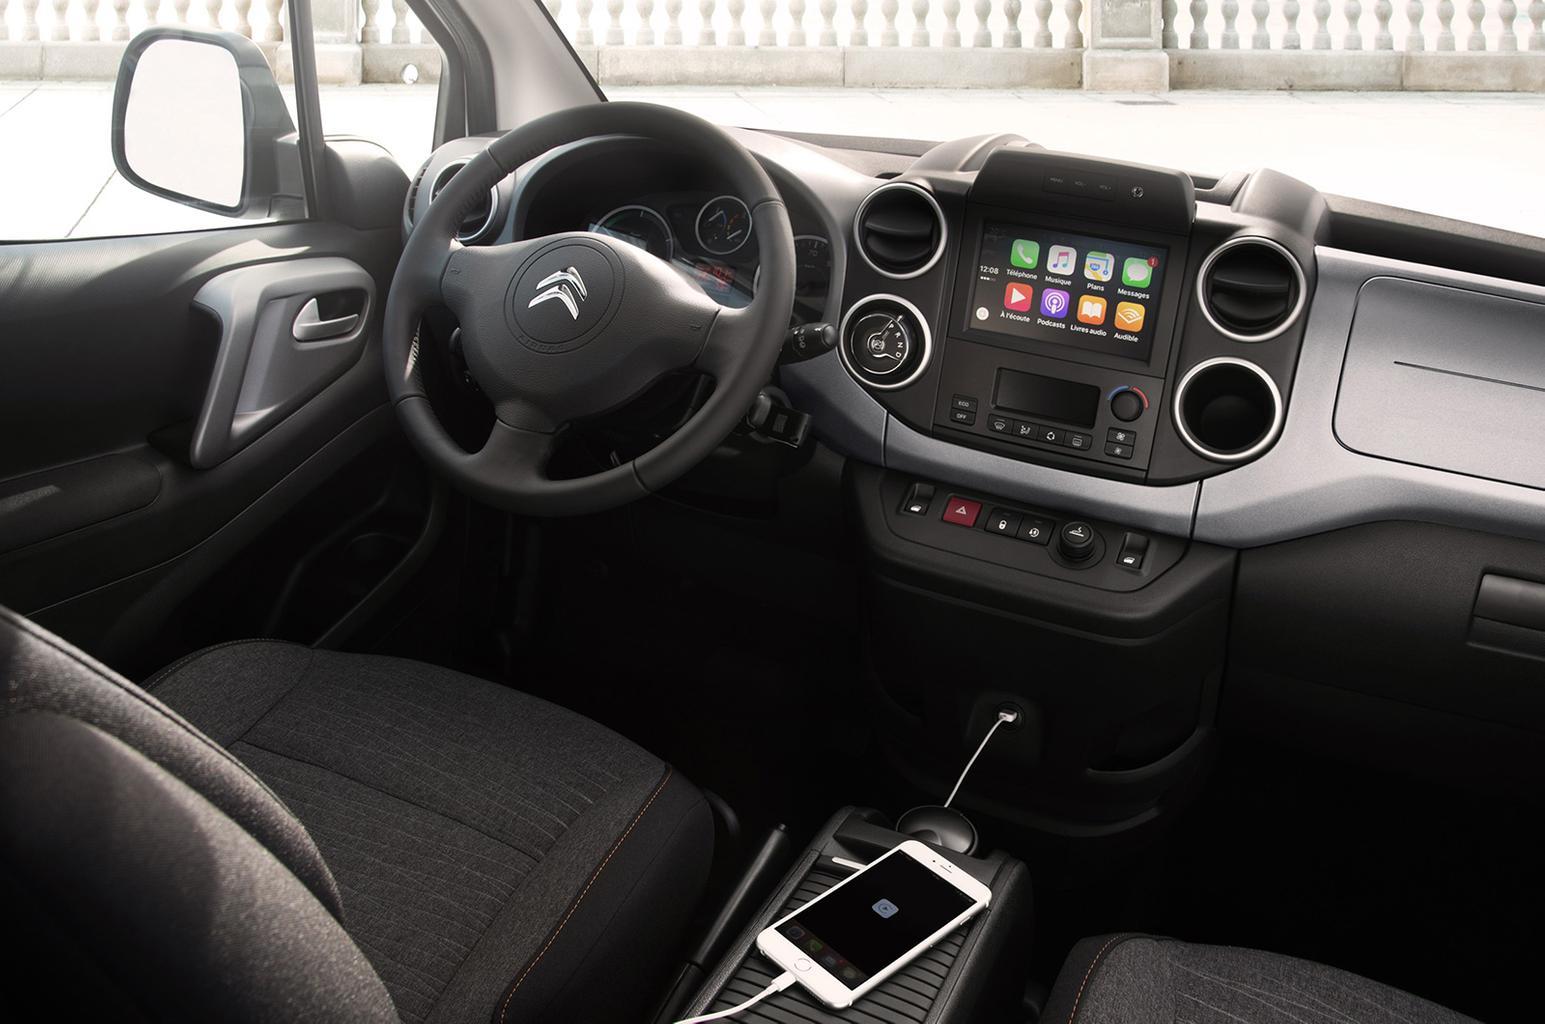 Citroën E-Berlingo Multispace to go on sale this autumn